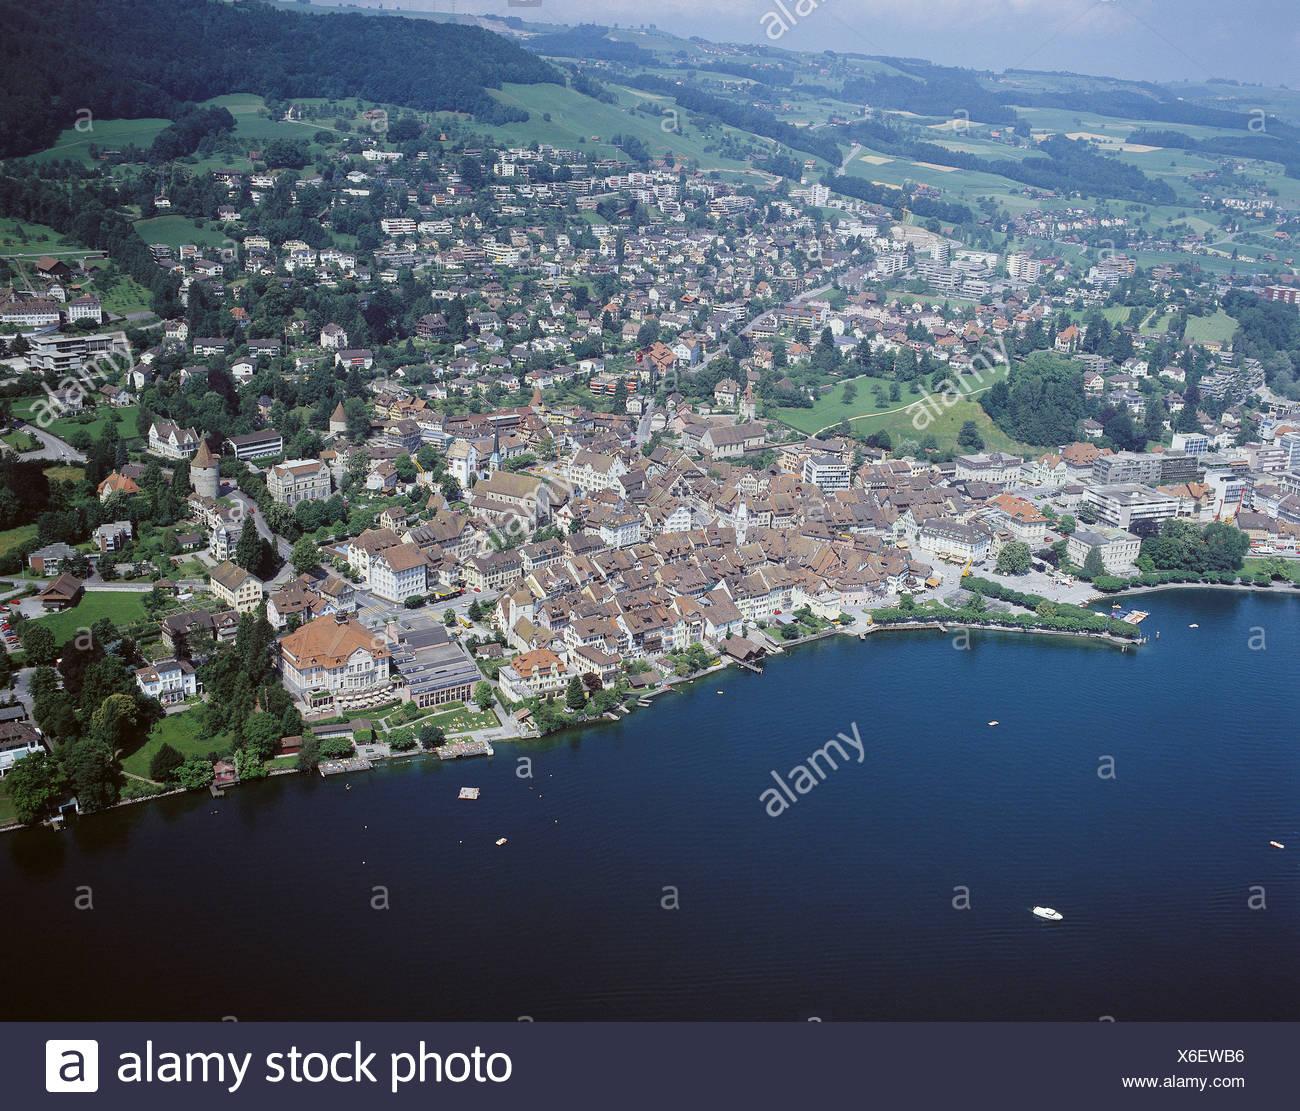 Zug Switzerland Aerial Stock Photos & Zug Switzerland Aerial Stock ...